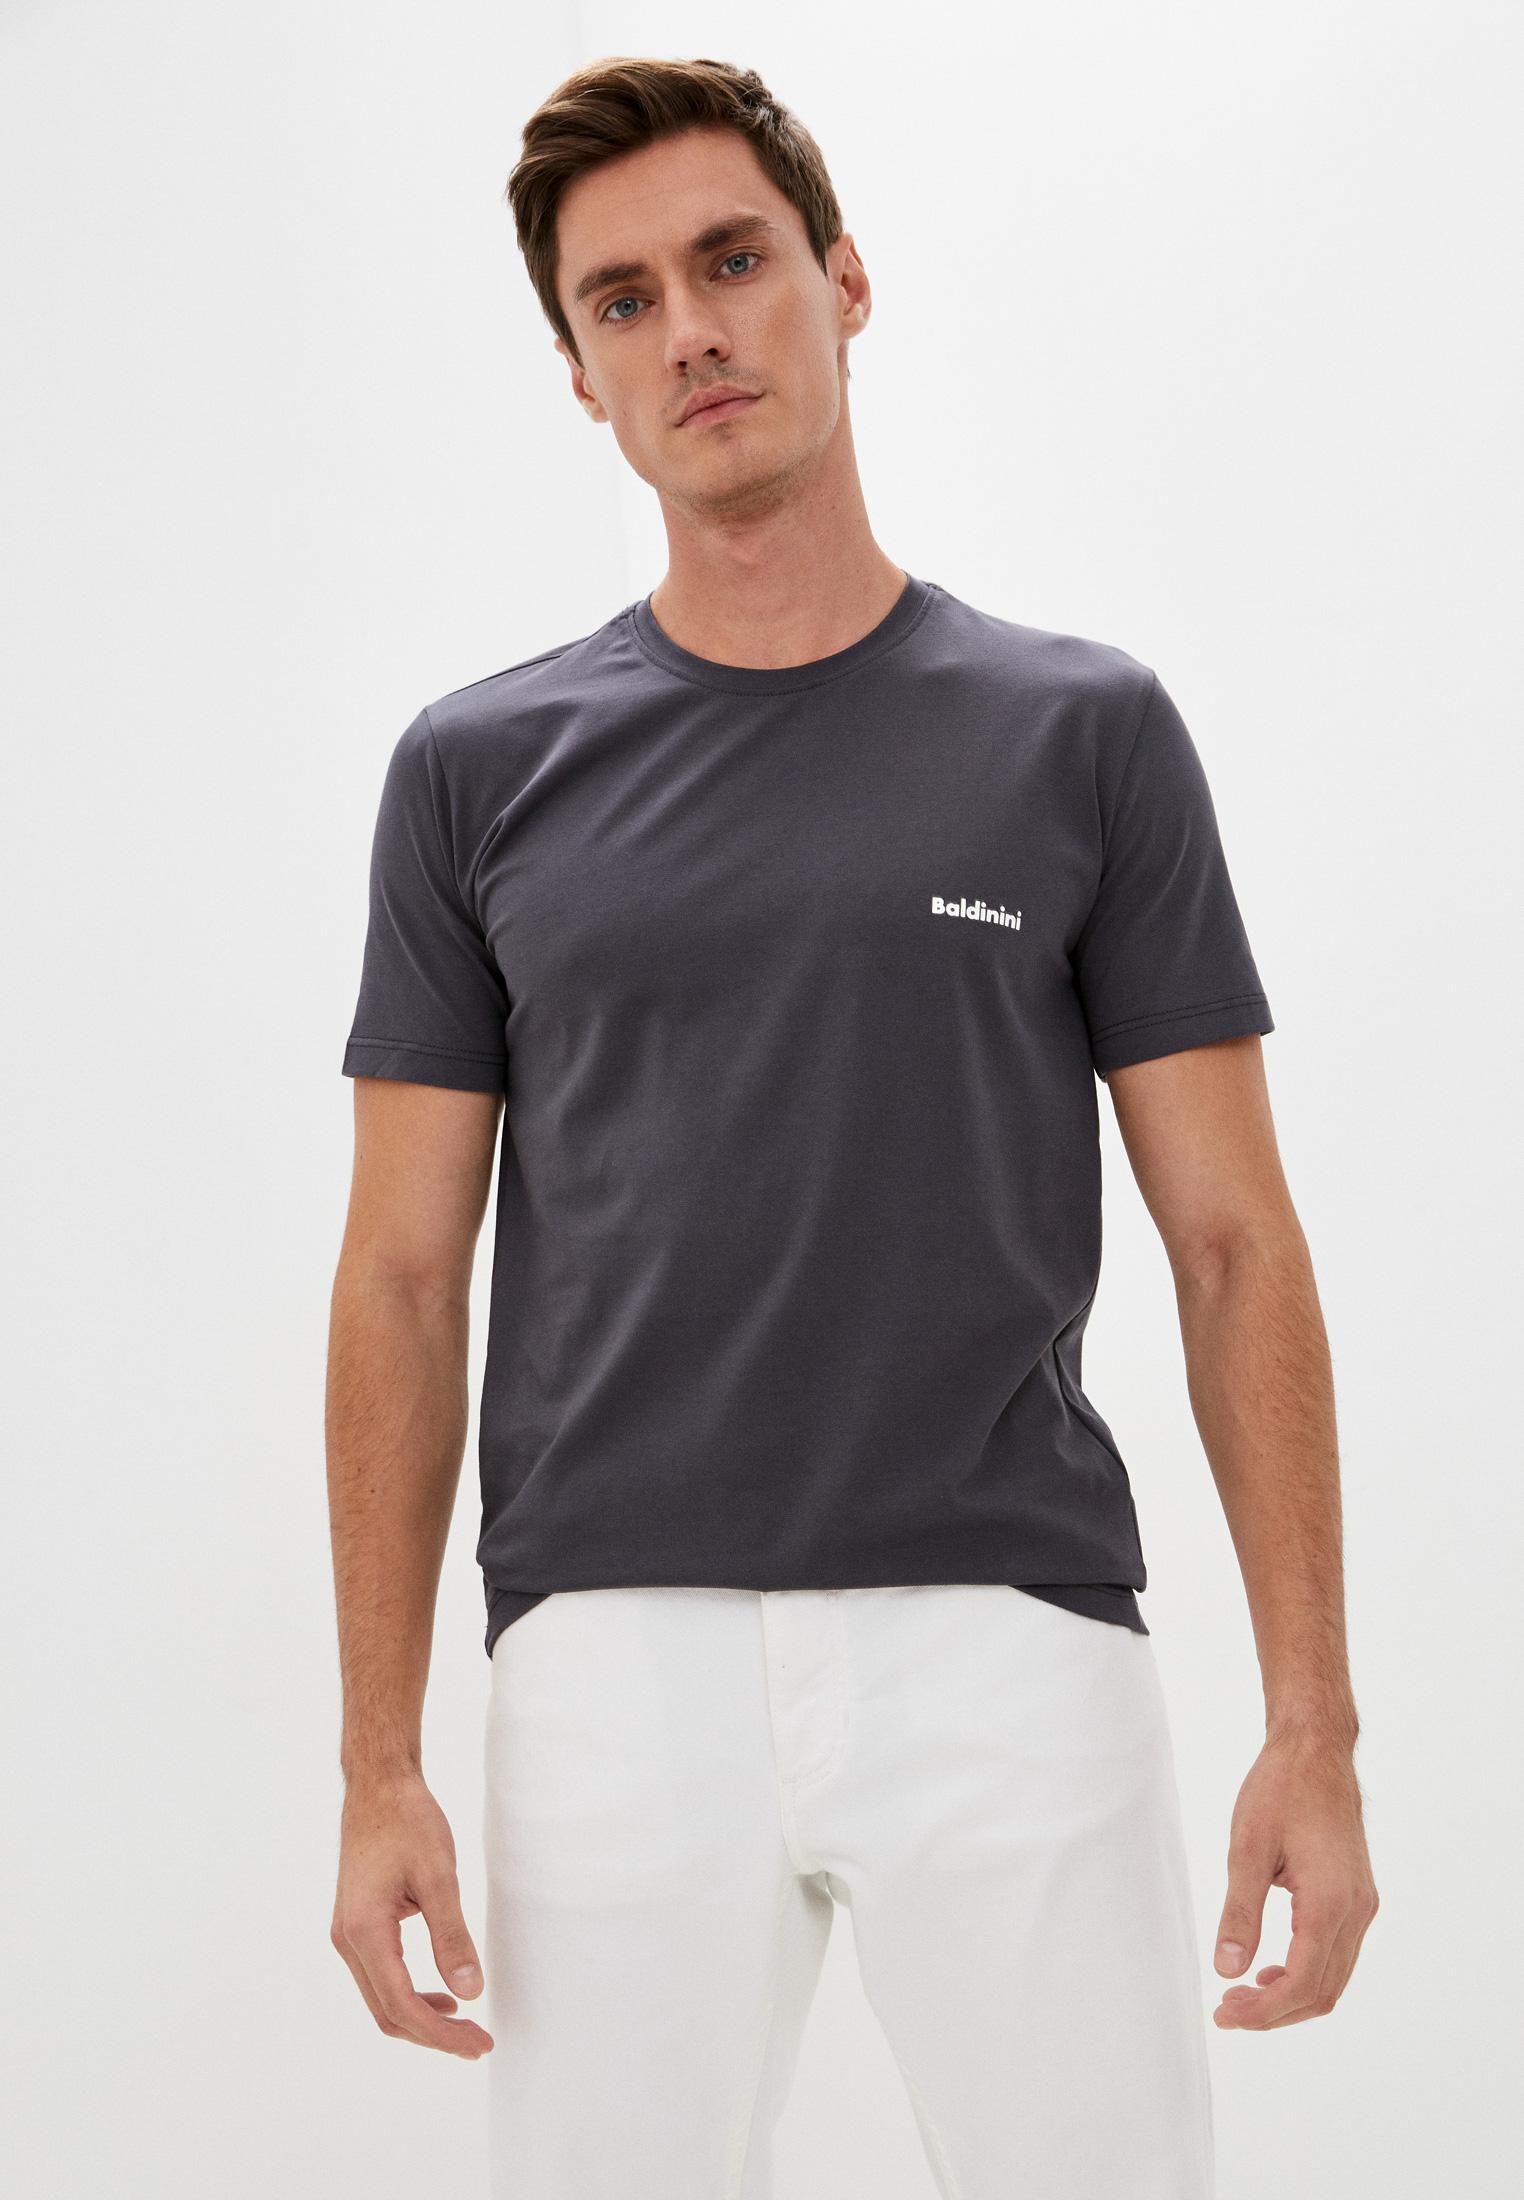 Мужская футболка Baldinini (Балдинини) TSU00: изображение 1